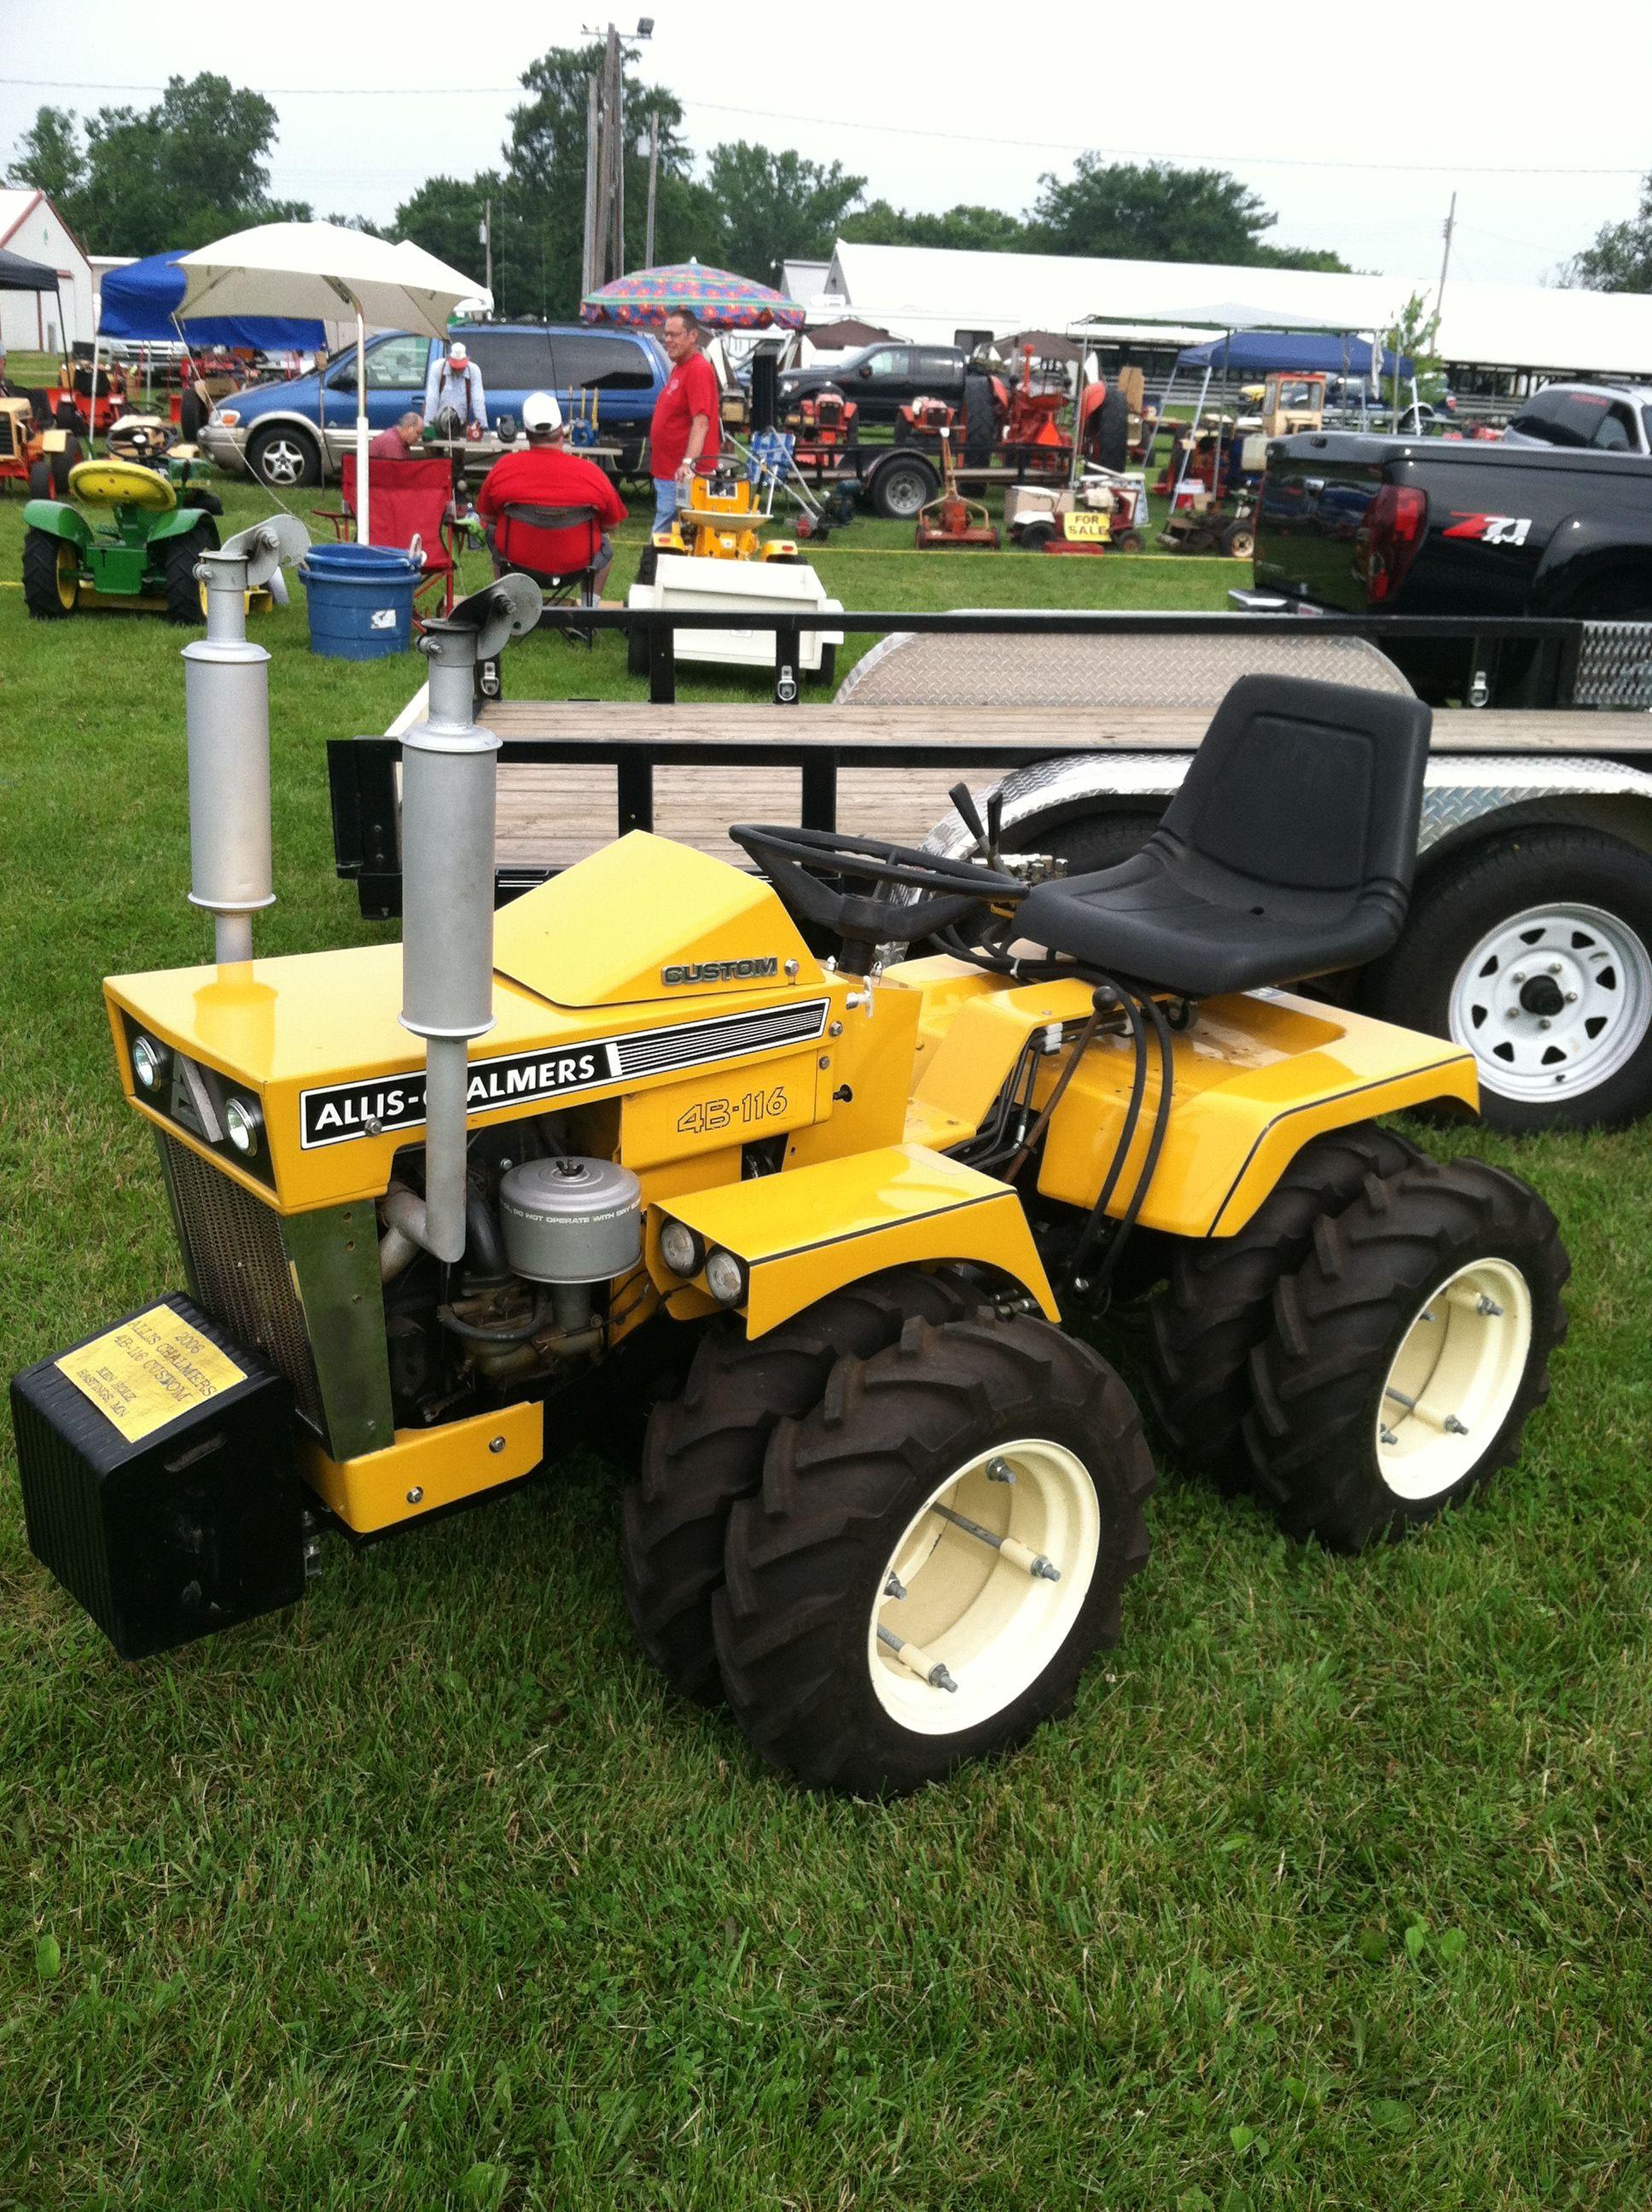 Allis Chalmers Garden Tractor For Sale